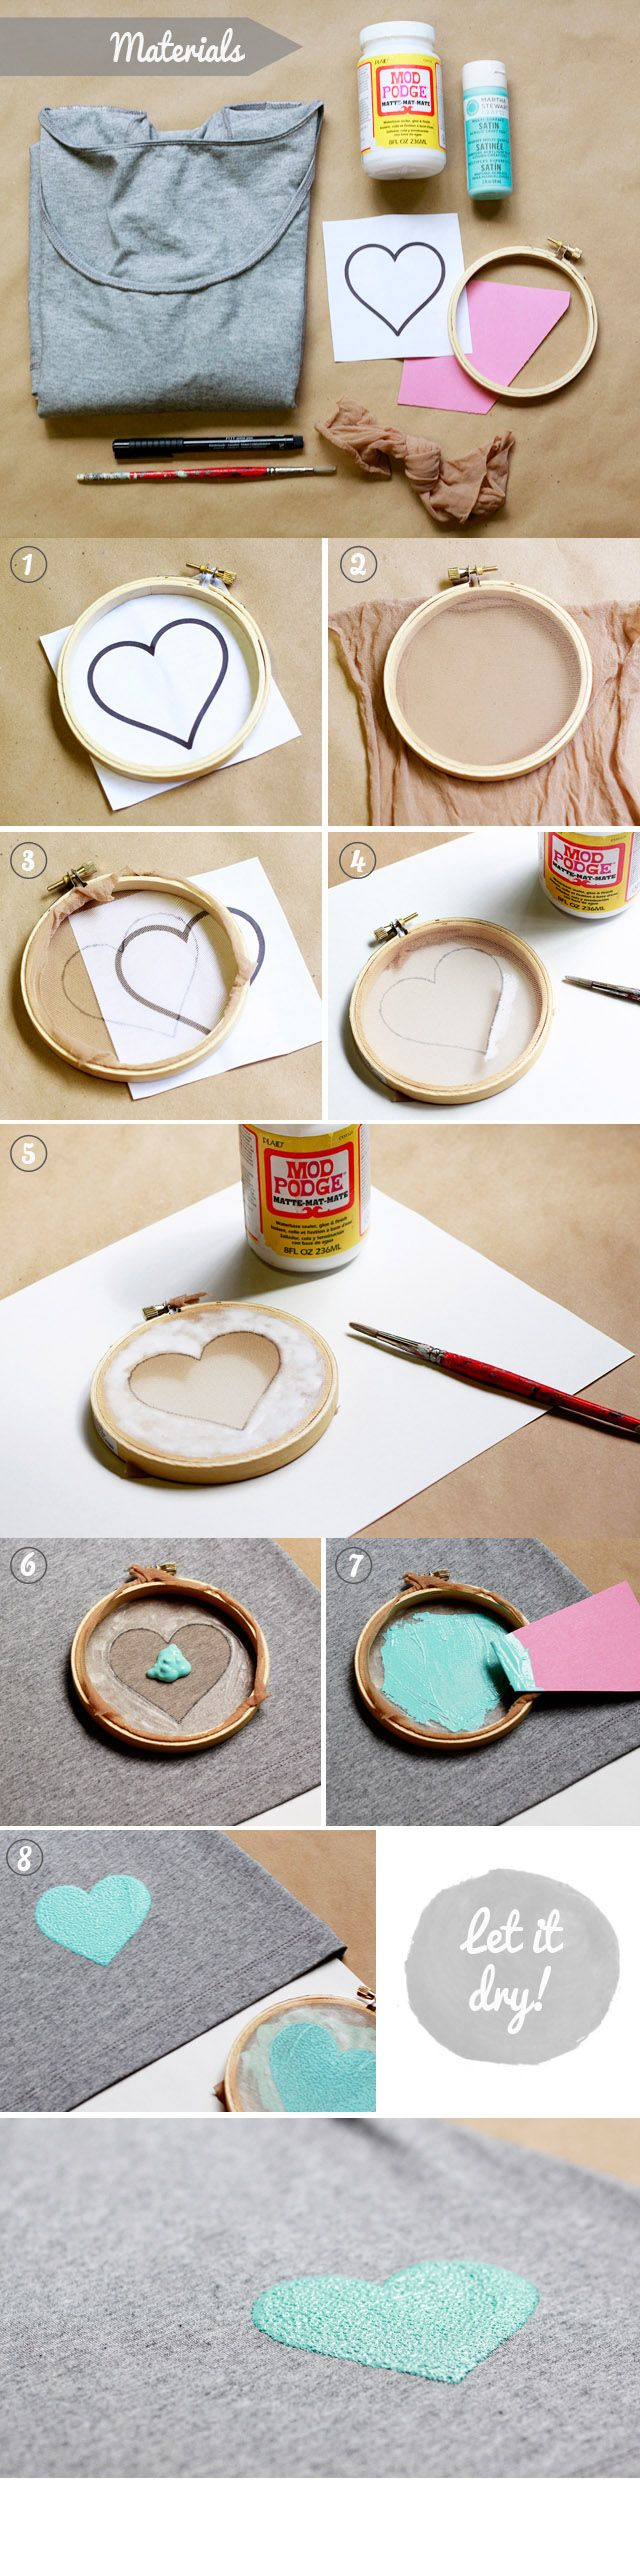 Diy screenprinting shirt modge podge fabric paint embroidery hoop